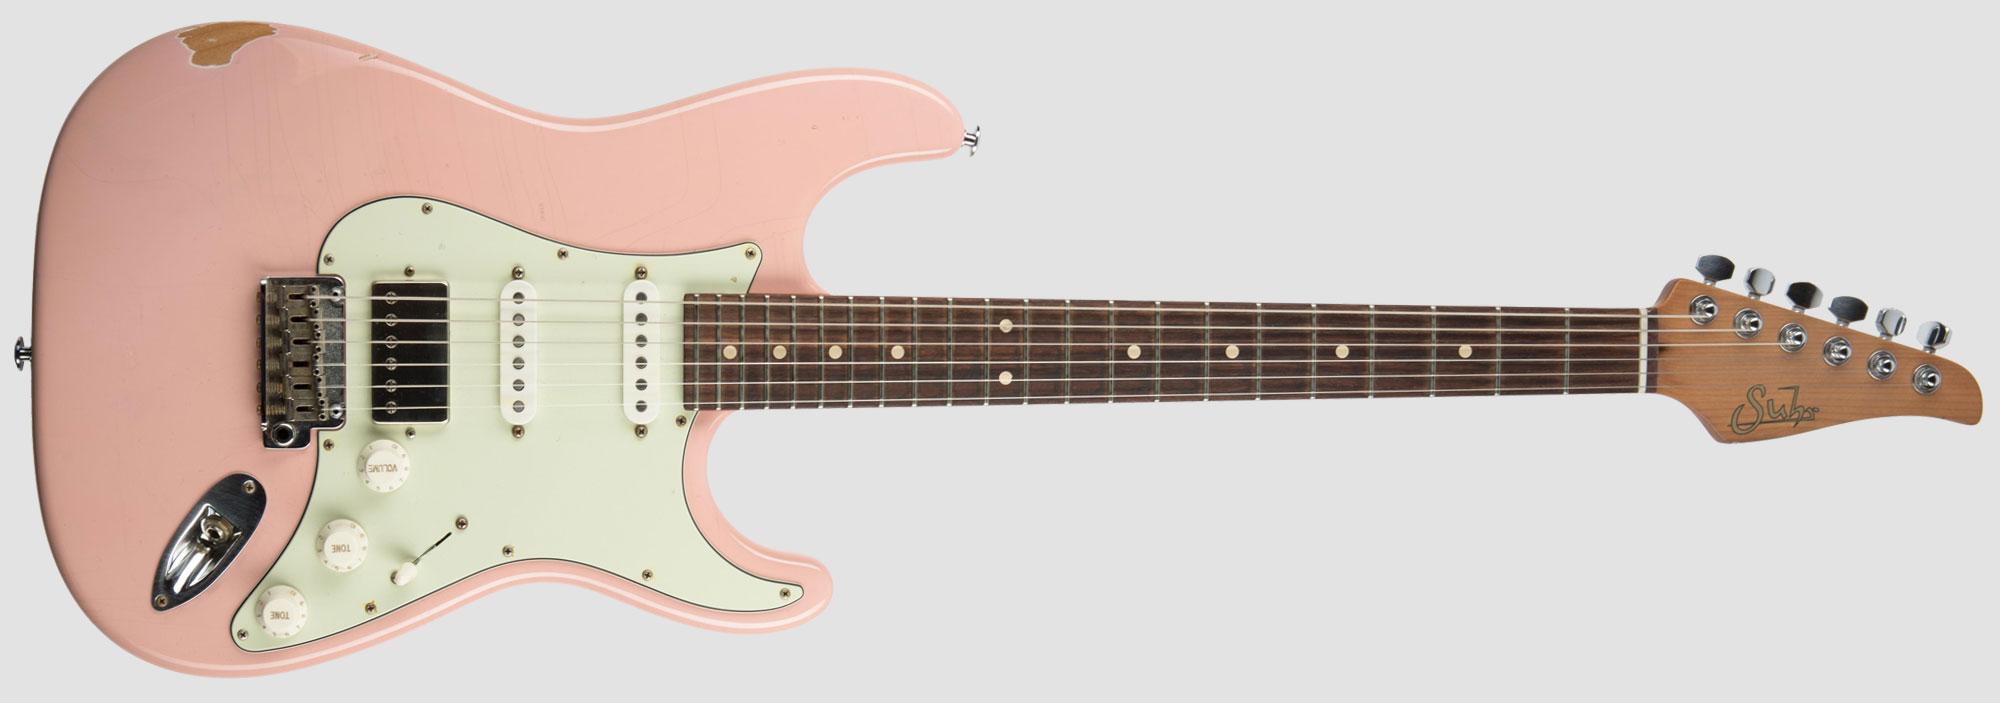 Suhr Wiring Diagram 2 Hum Electrical Diagrams Guitars Guitar Explore Schematic U2022 Dual Humbucker